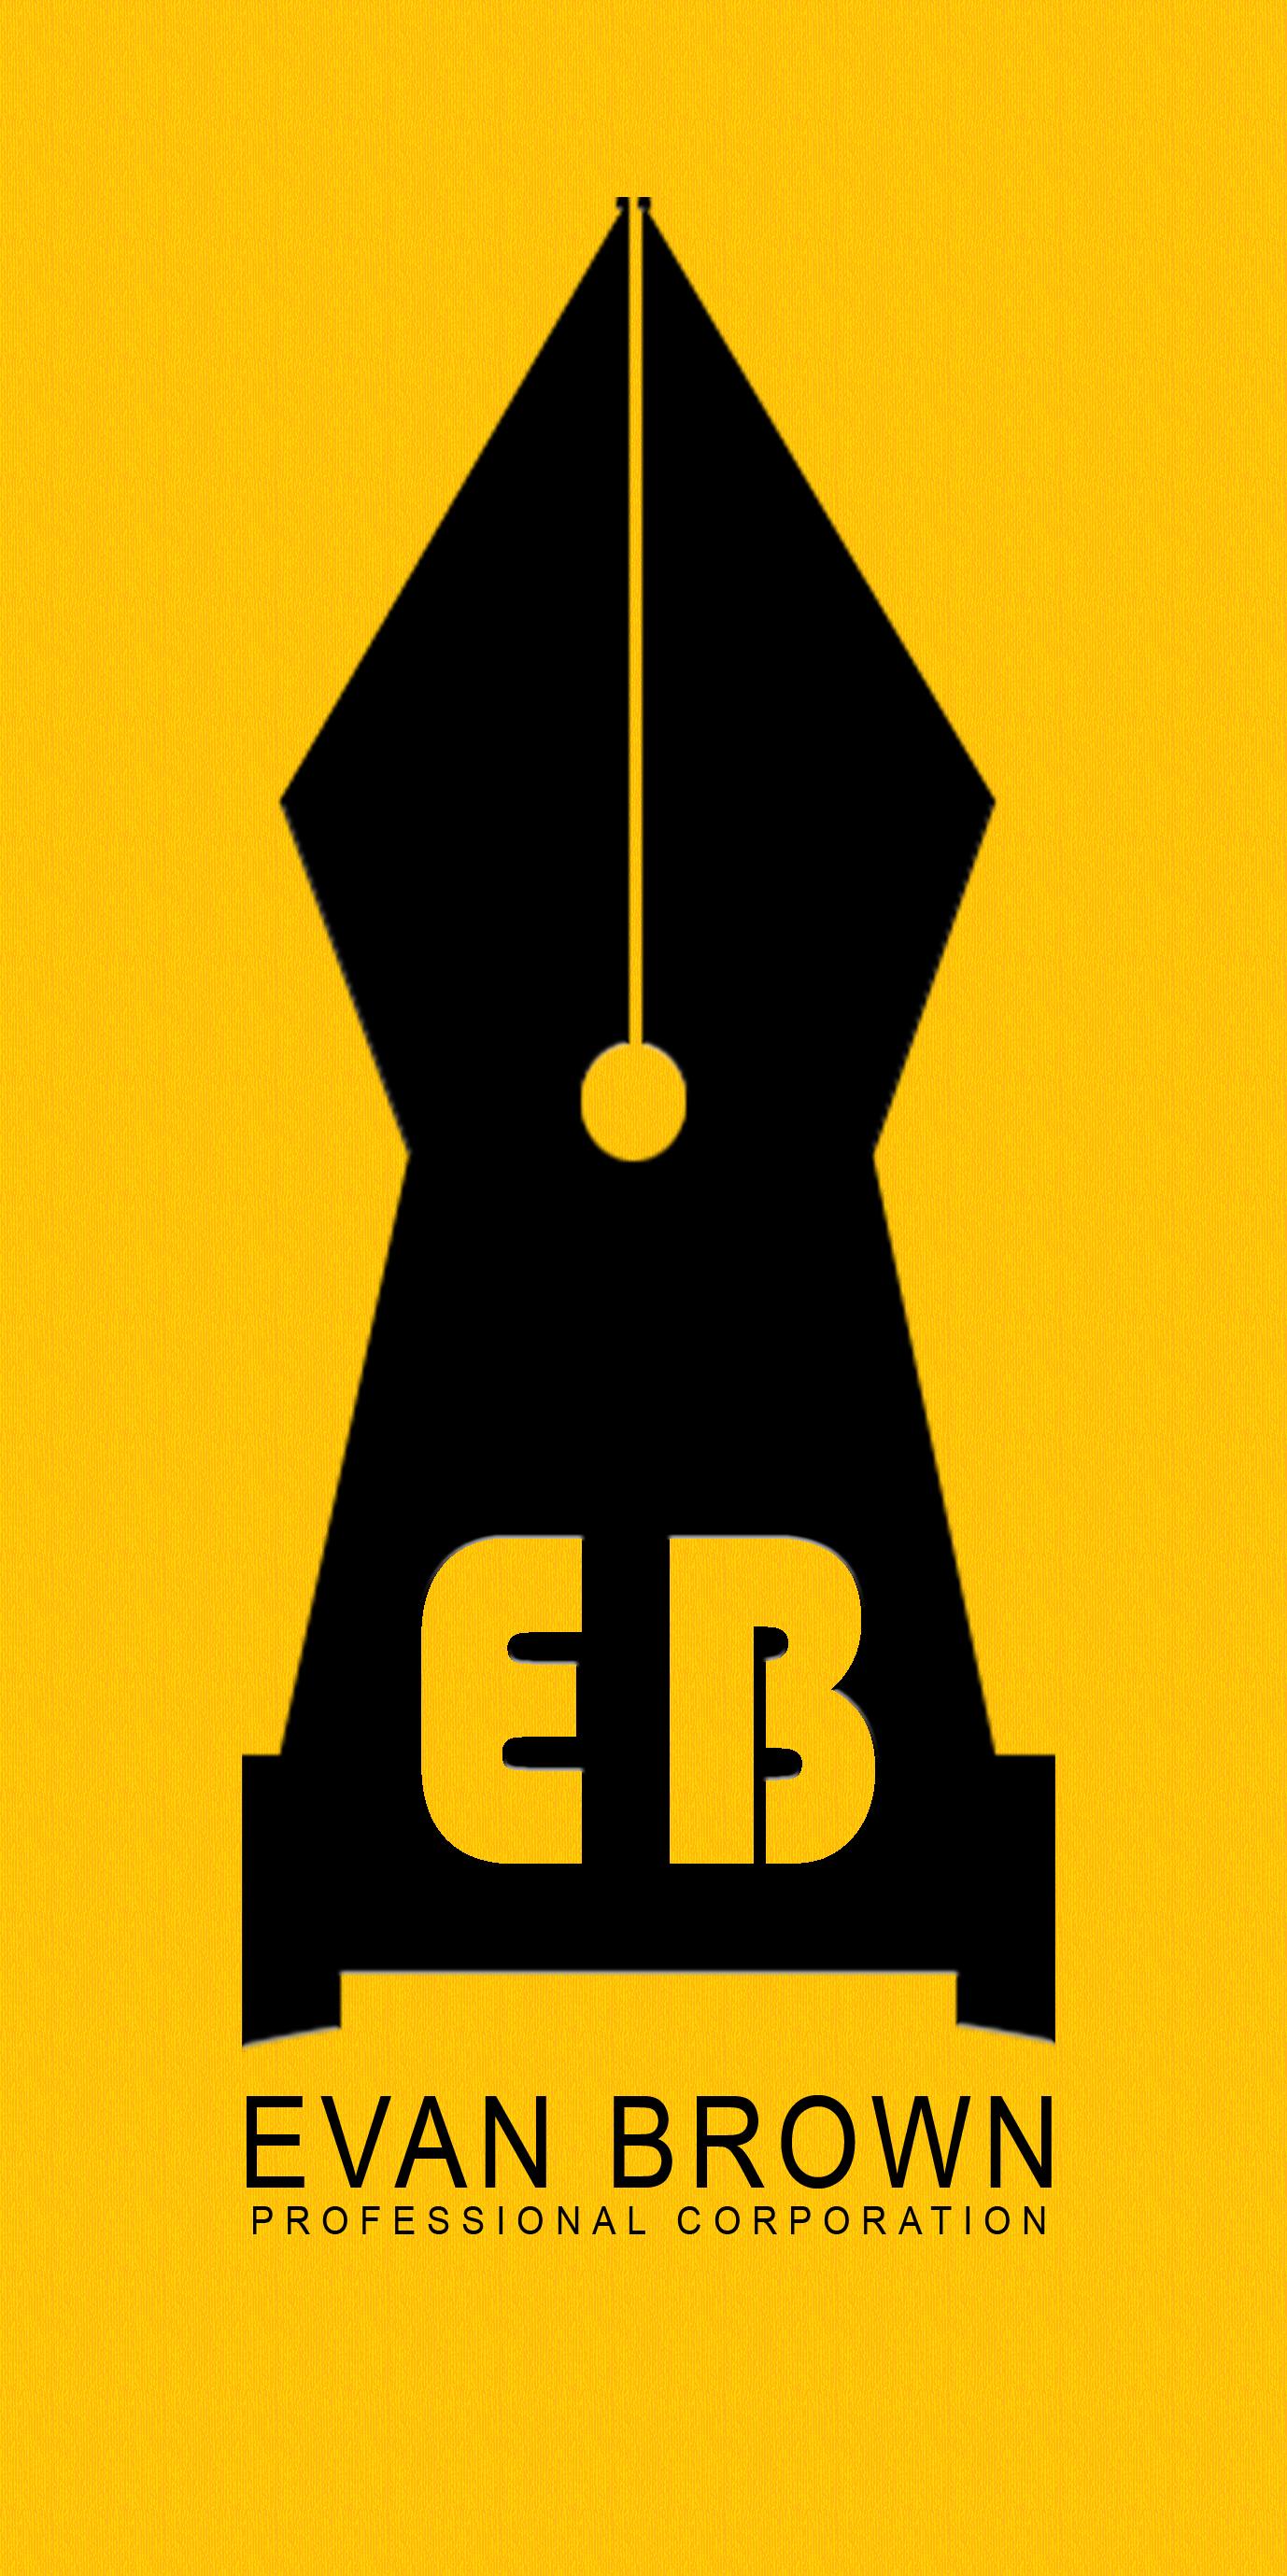 Logo Design by Vineeth K V - Entry No. 48 in the Logo Design Contest Inspiring Logo Design for Evan Brown Professional Corporation.